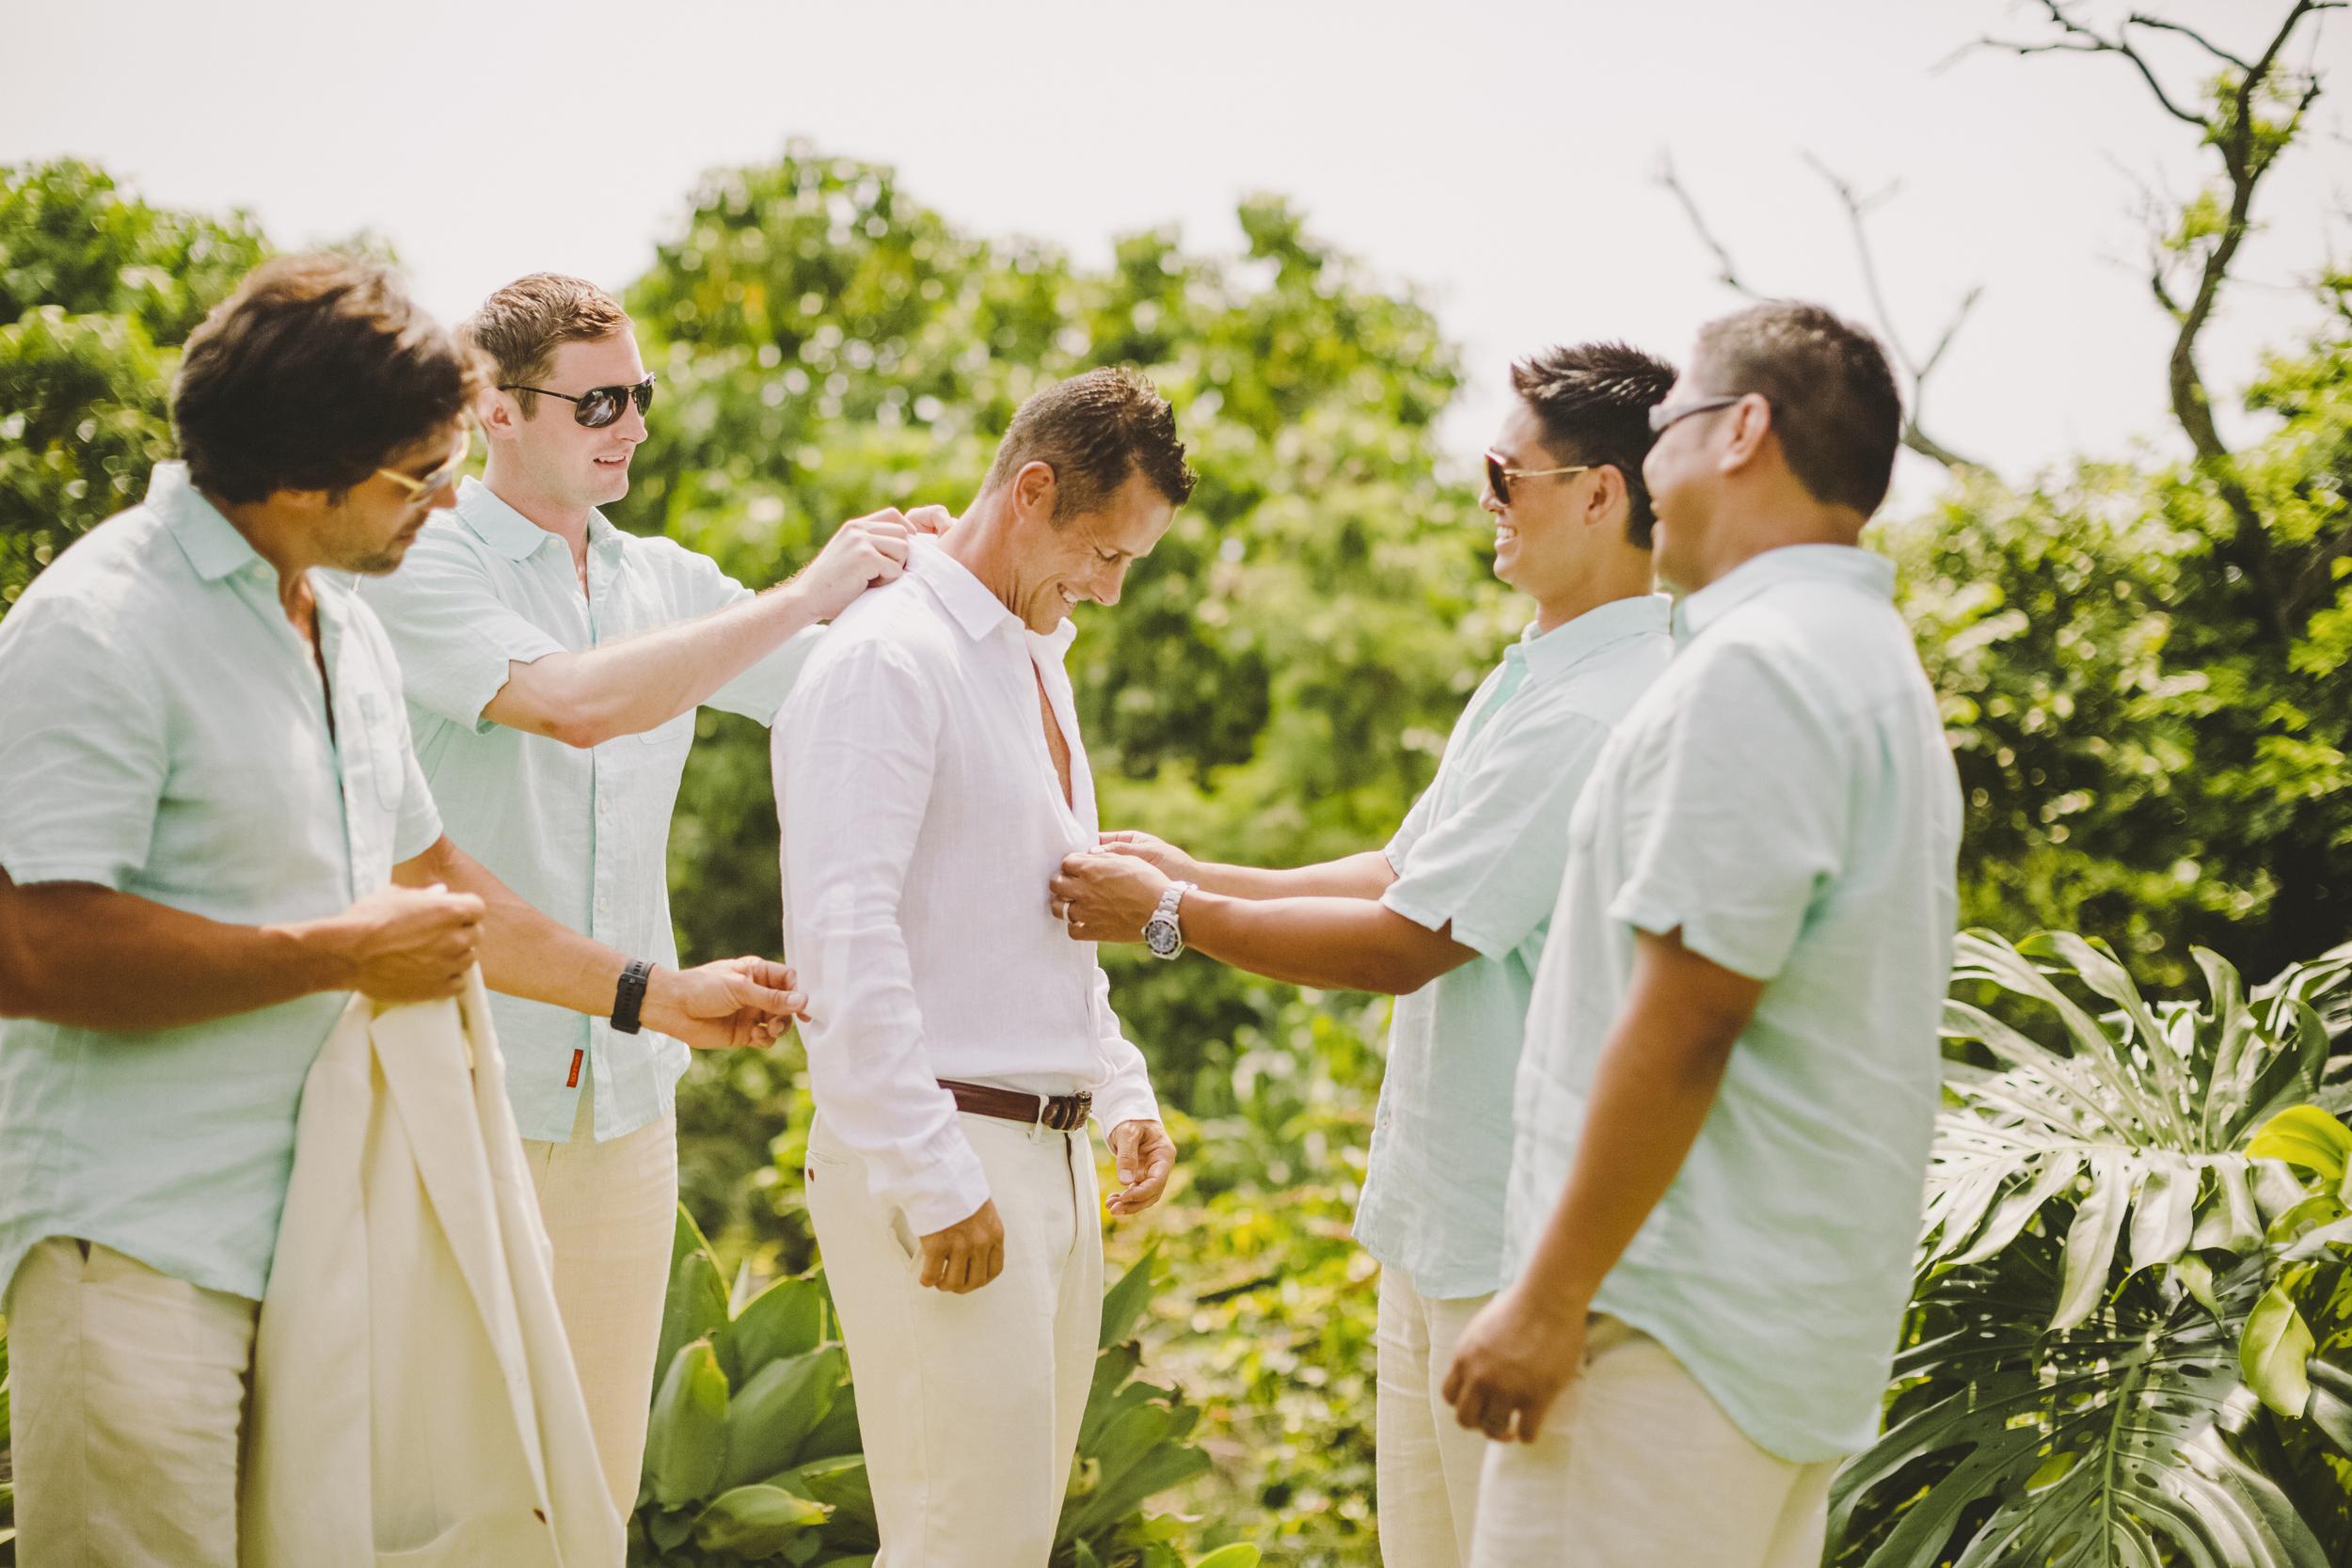 angie-diaz-photography-hawaii-wedding-photographer-kelli-jay-23.jpg